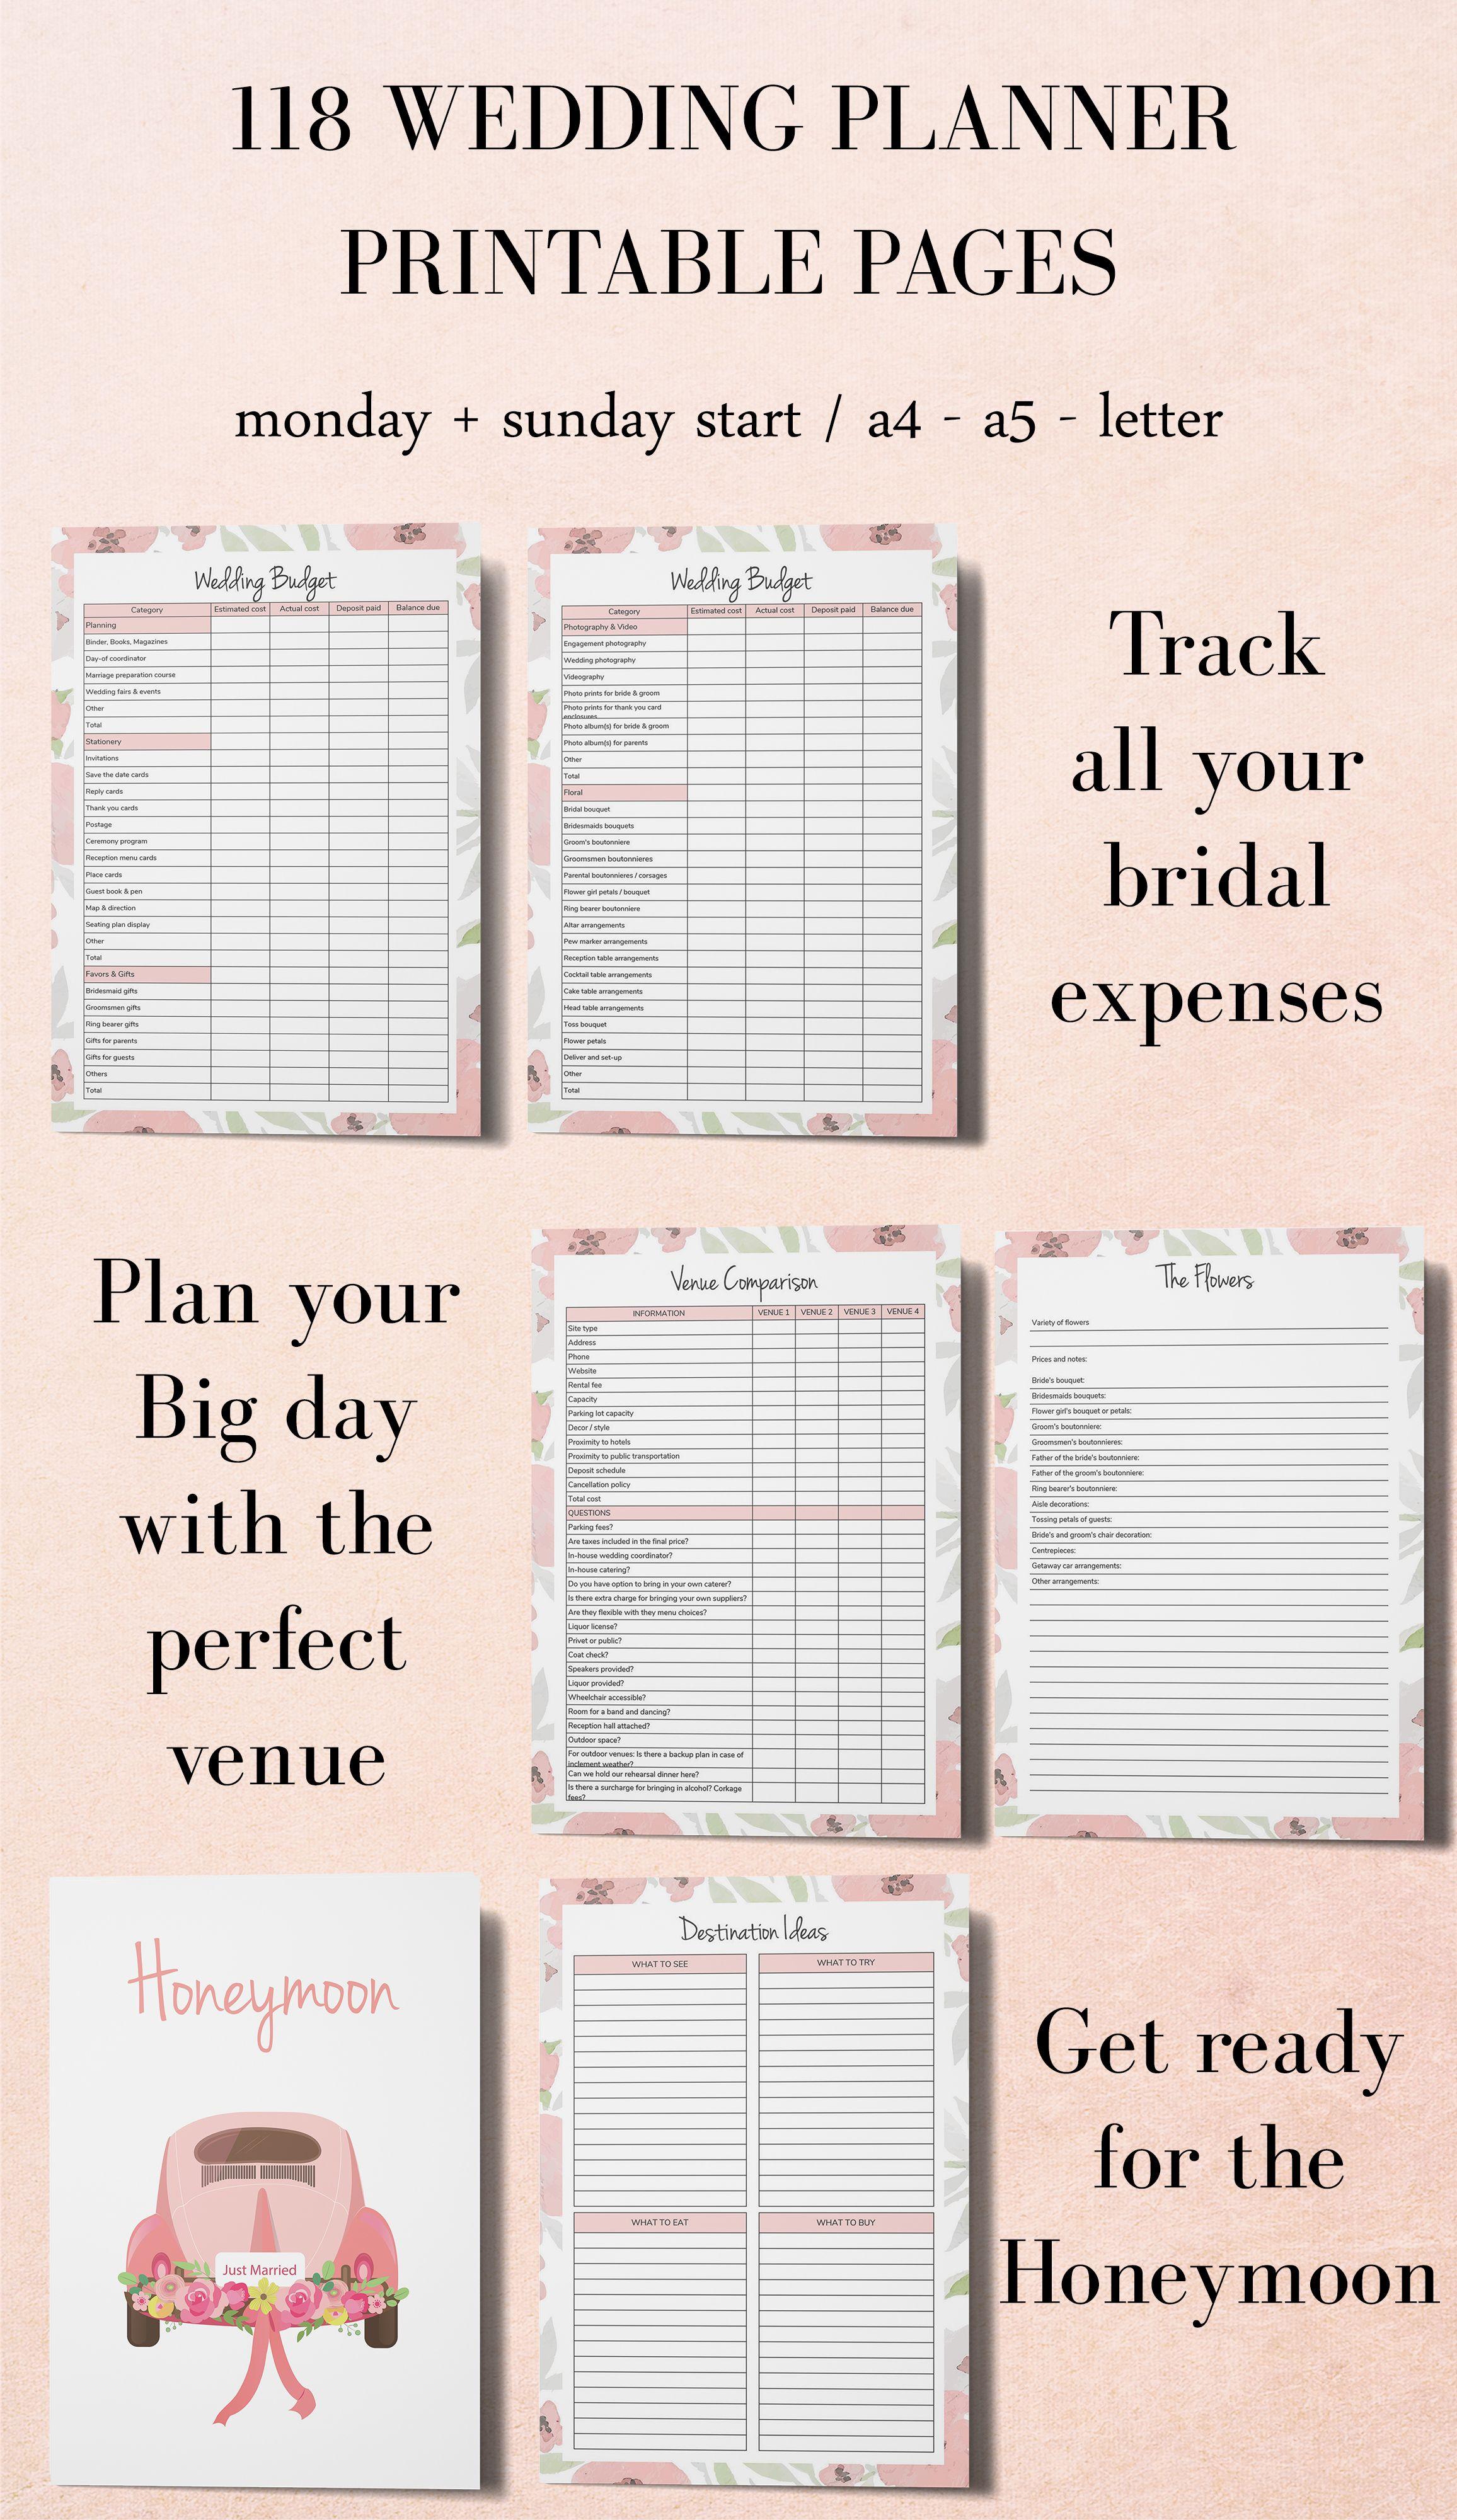 Wedding 101 The Planning Binder Diy Wedding Planner Binder Diy Wedding Planner Wedding Planning Binder